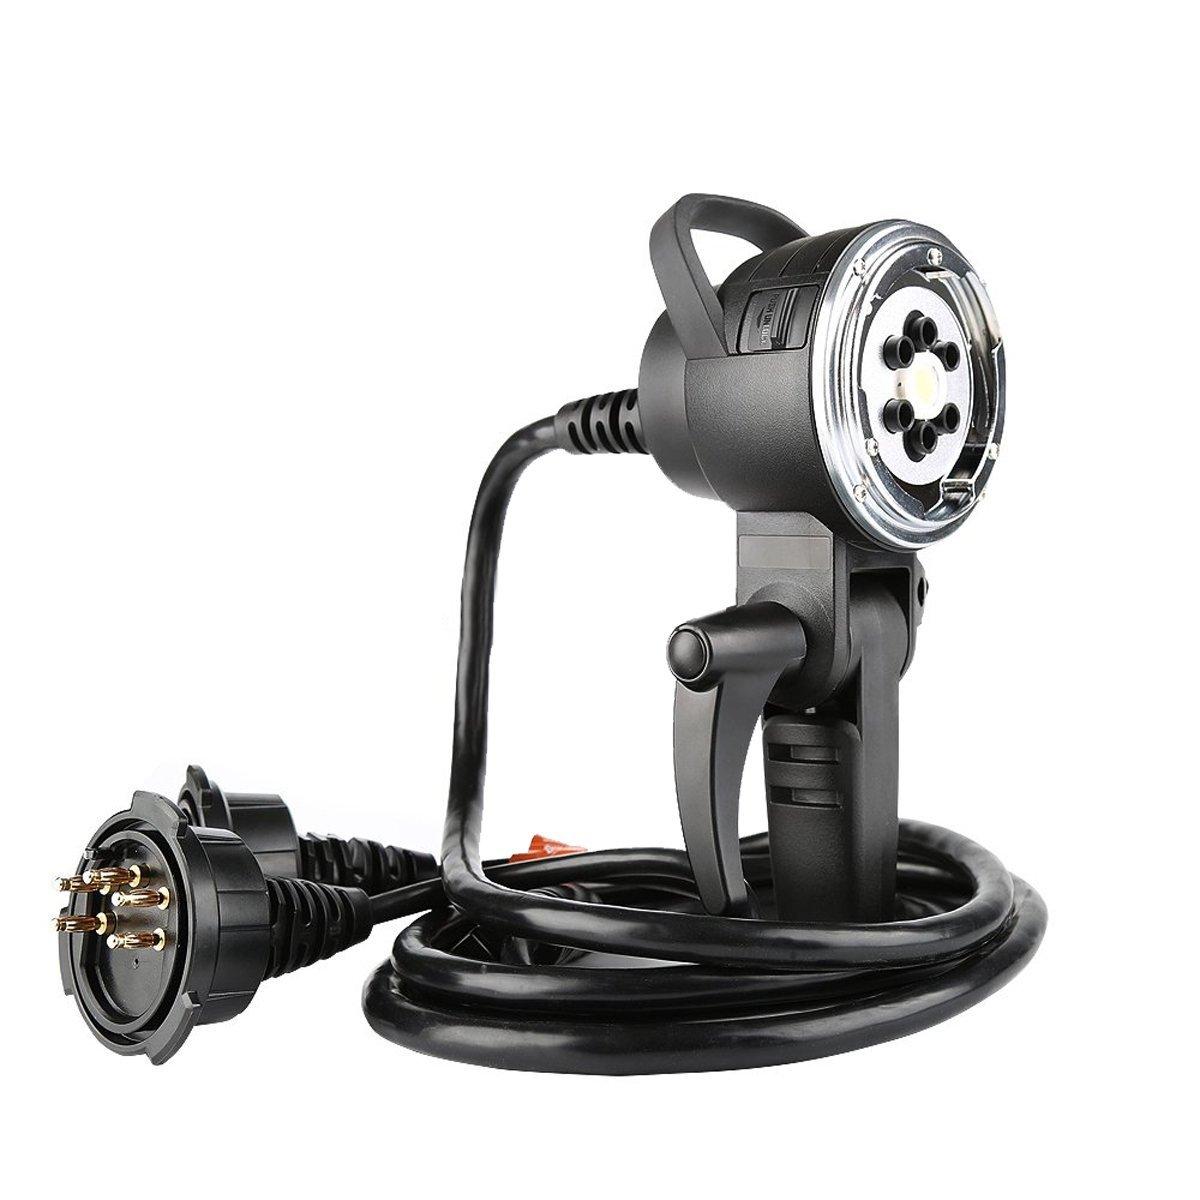 Godox AD-1200 1200W Portable Flash Head Godox Mount Off-Camera Light Lamp Flash Head for 2pcs Godox Mount Flashes AD600 AD600M